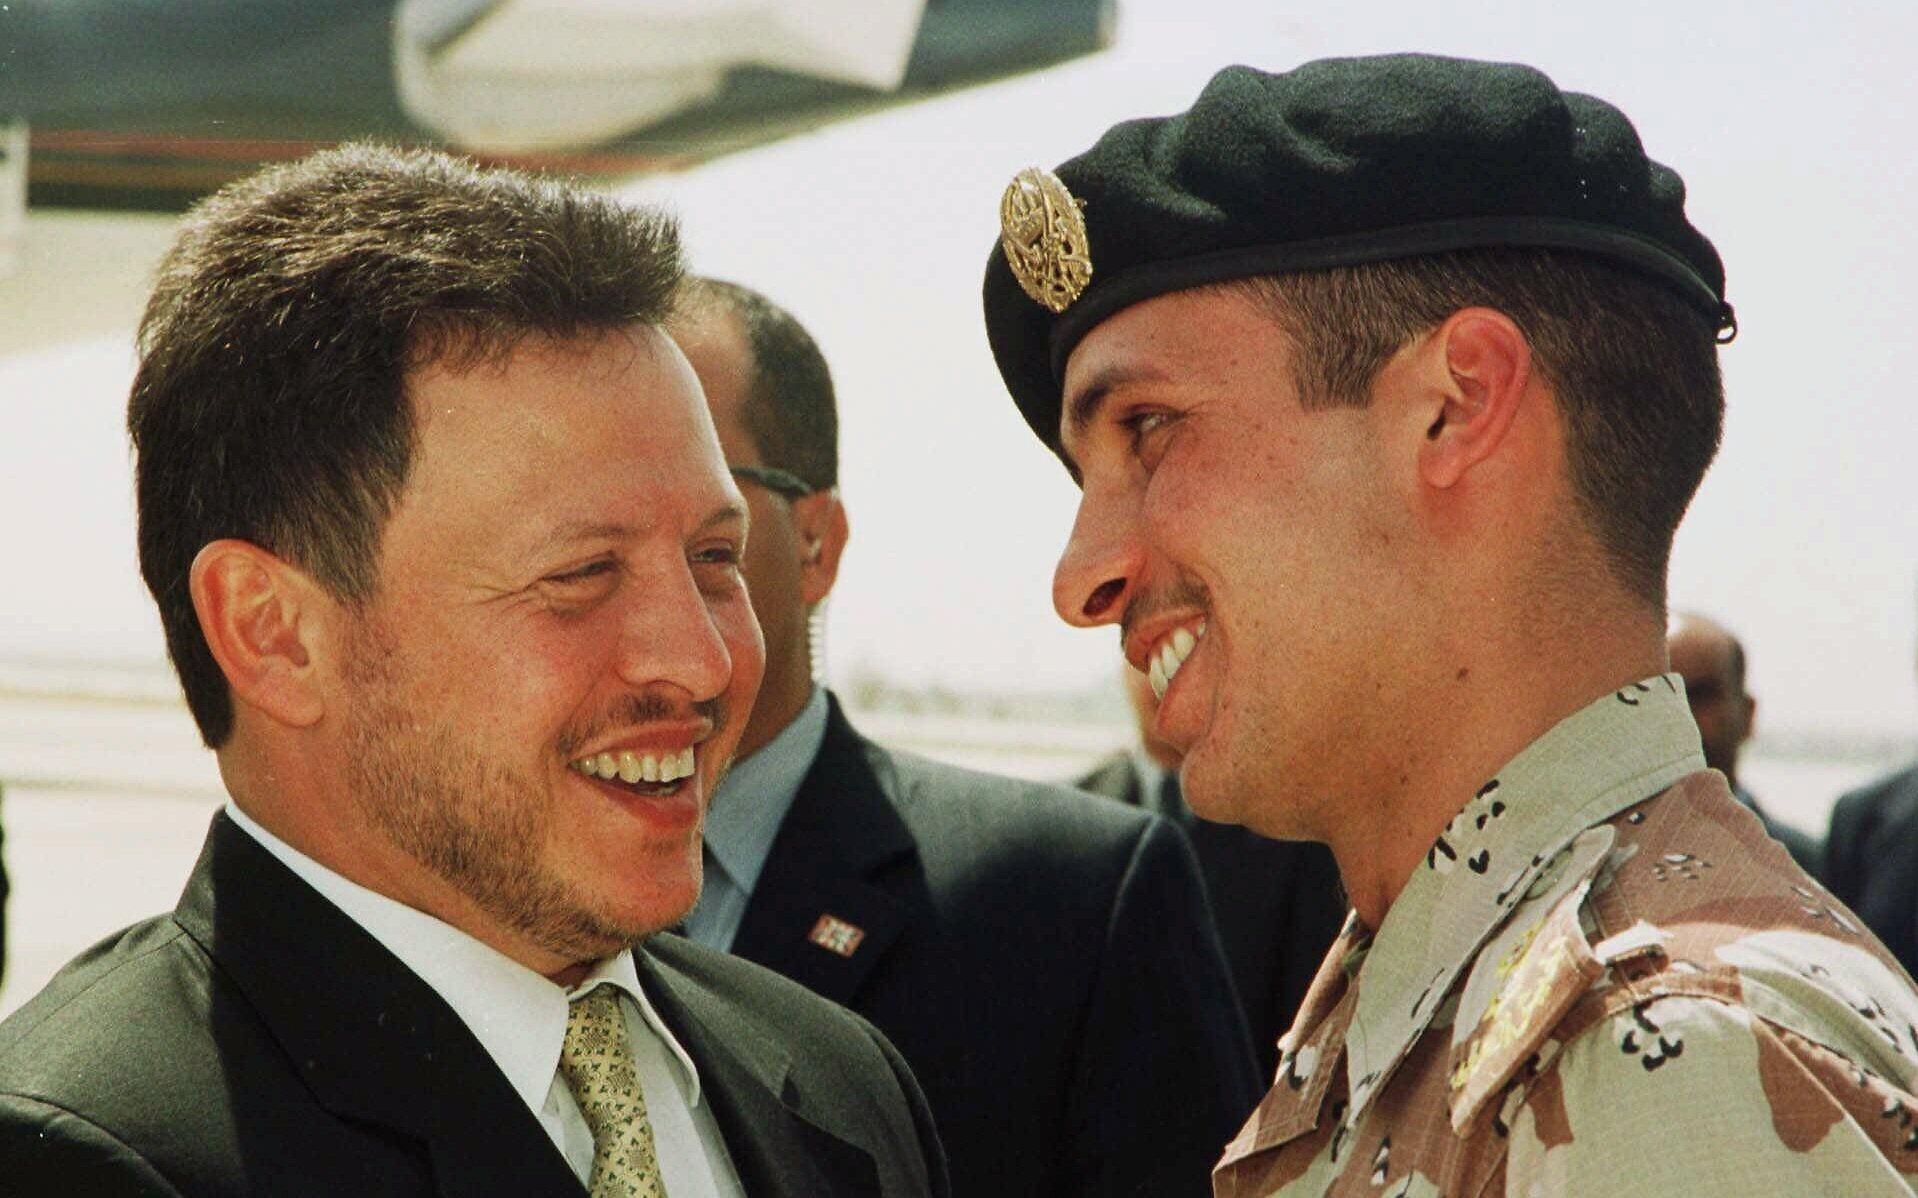 Jordan's King Abdullah II laughs with his half-brother then-crown prince Hamzah Bin Hussein right